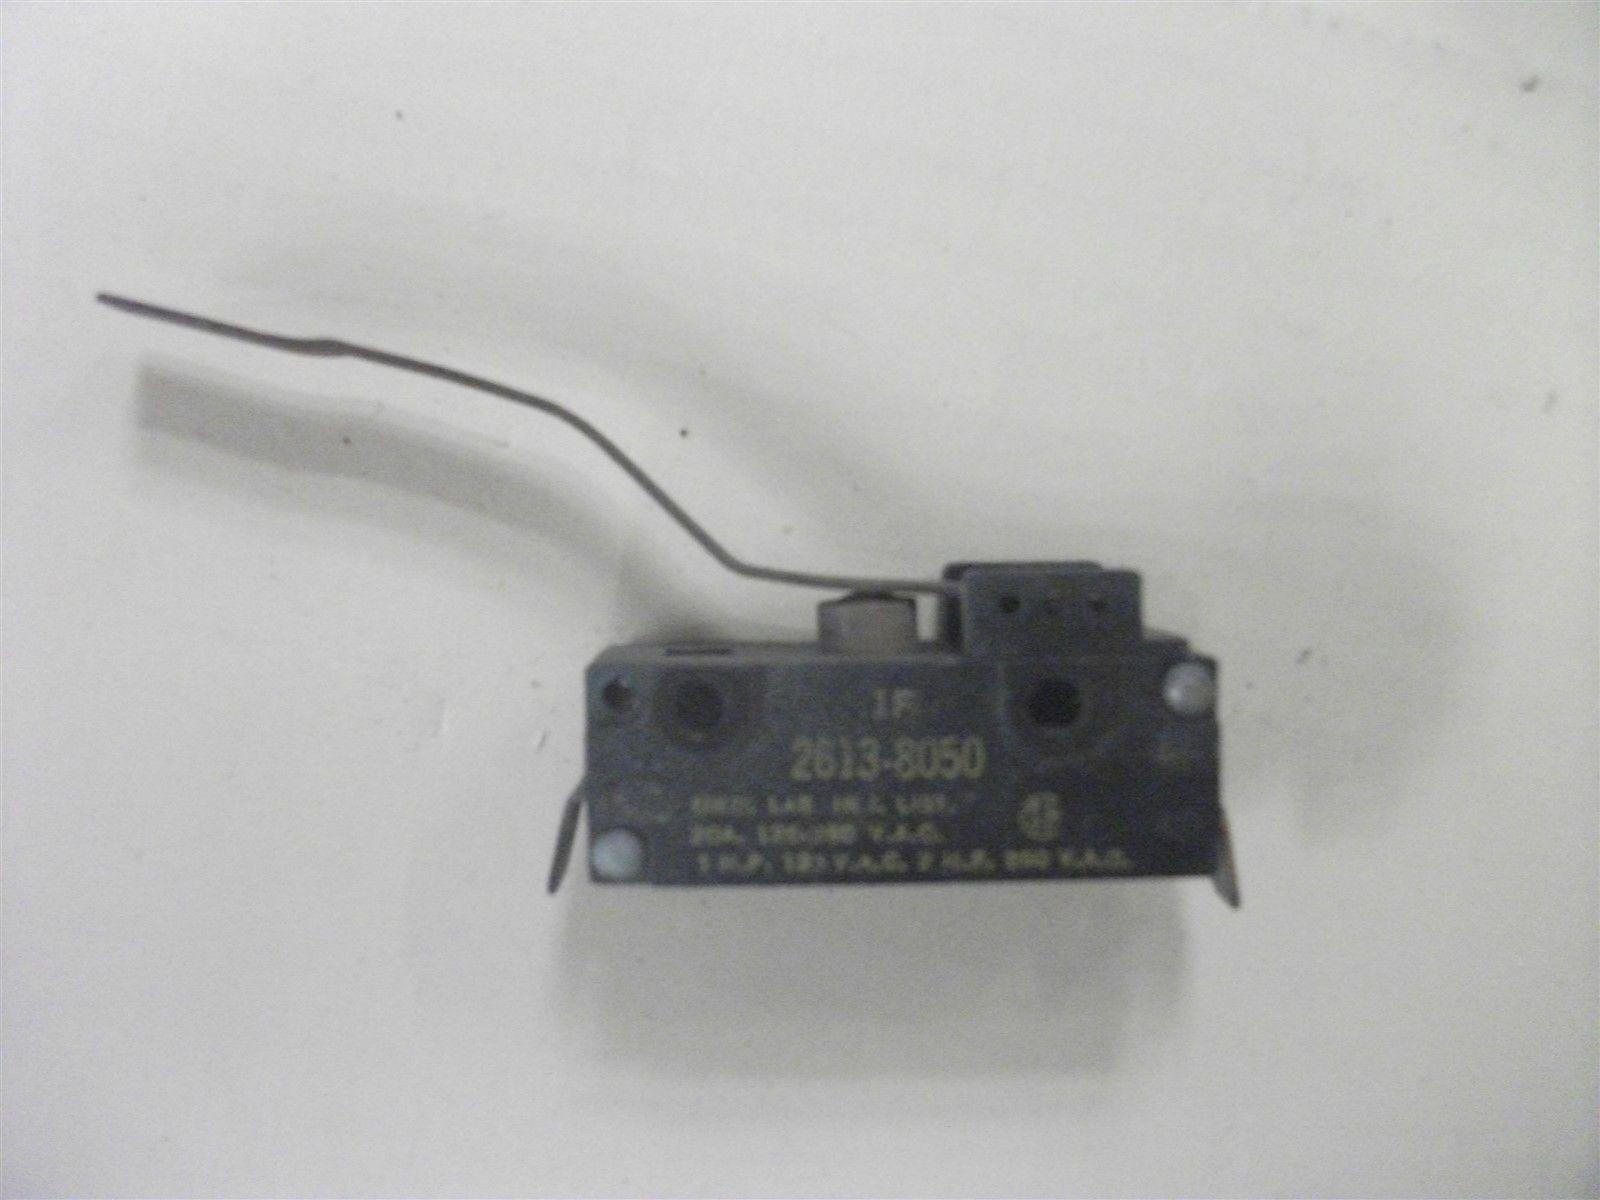 122116 ORIGINAL 24V LINT DRAWER SWITCH FOR  AMERICAN DRYER